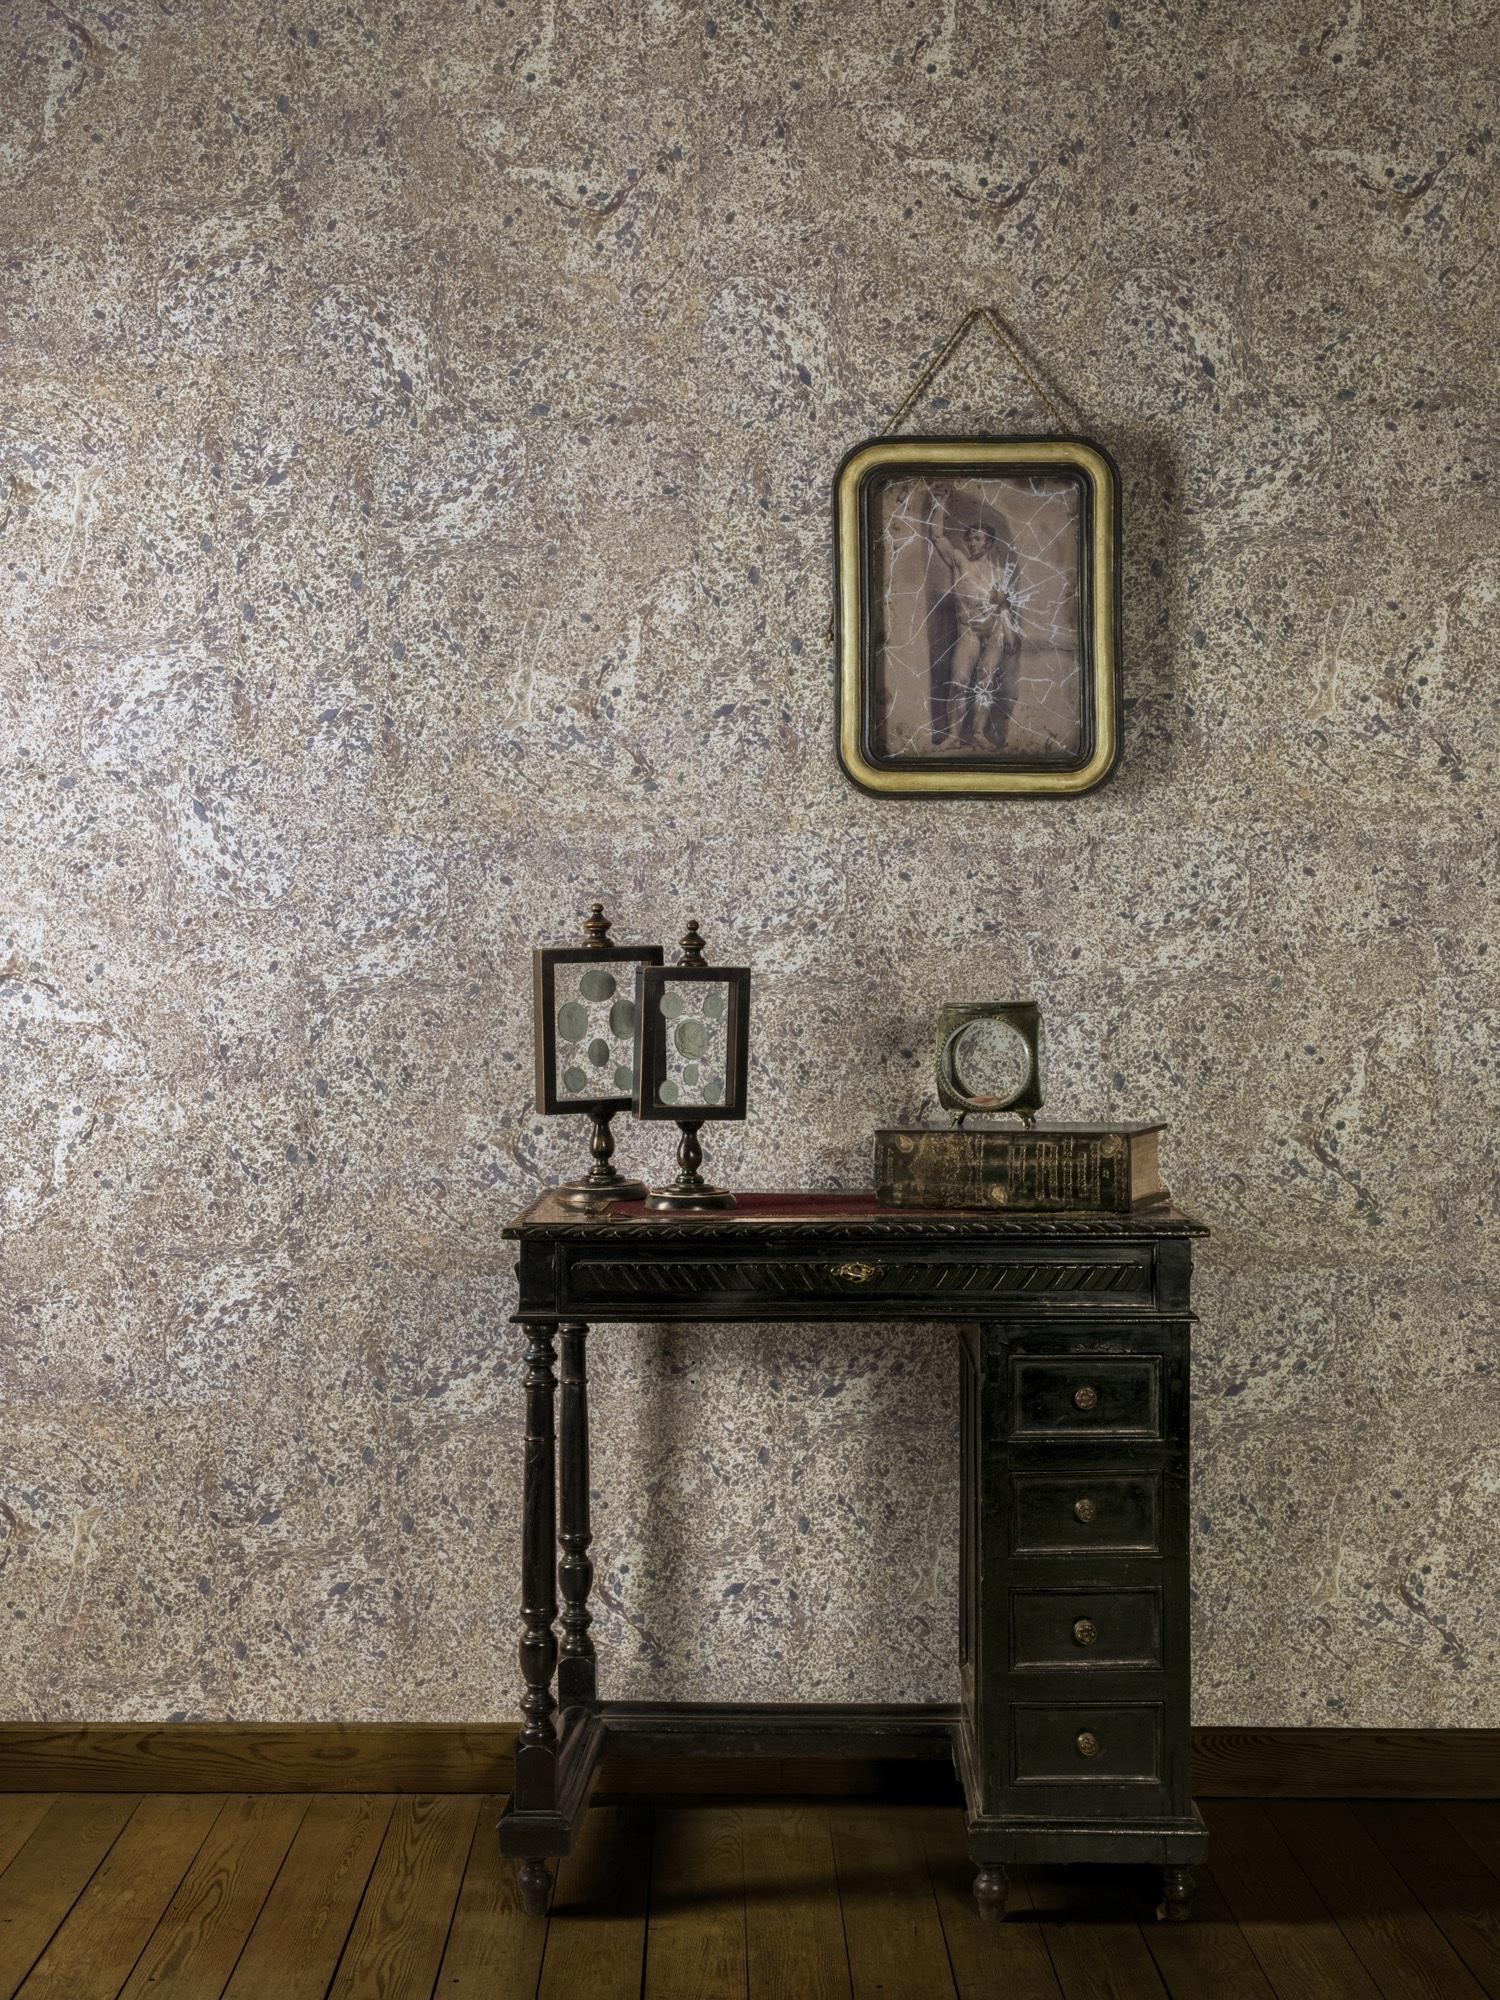 Layout mockup of furnishings by Quadrature Interiors